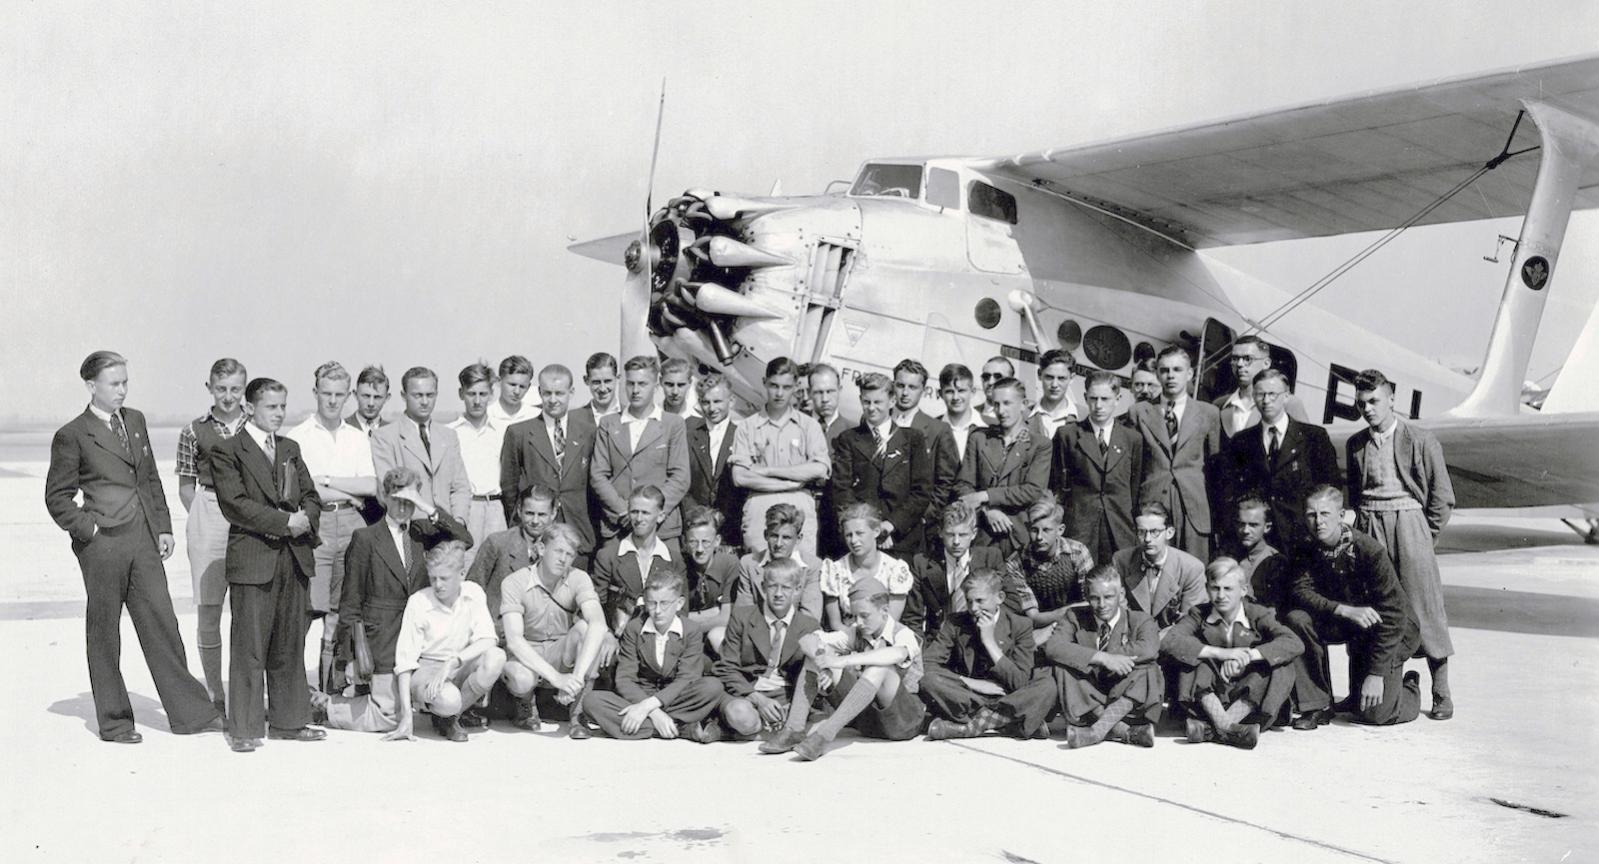 Naam: Foto 33. Tekst bij deze grote foto. Jeugdluchtvaartdag 1 Juli 1939, Amsterdam. 1600 breed.jpg Bekeken: 268 Grootte: 172,1 KB